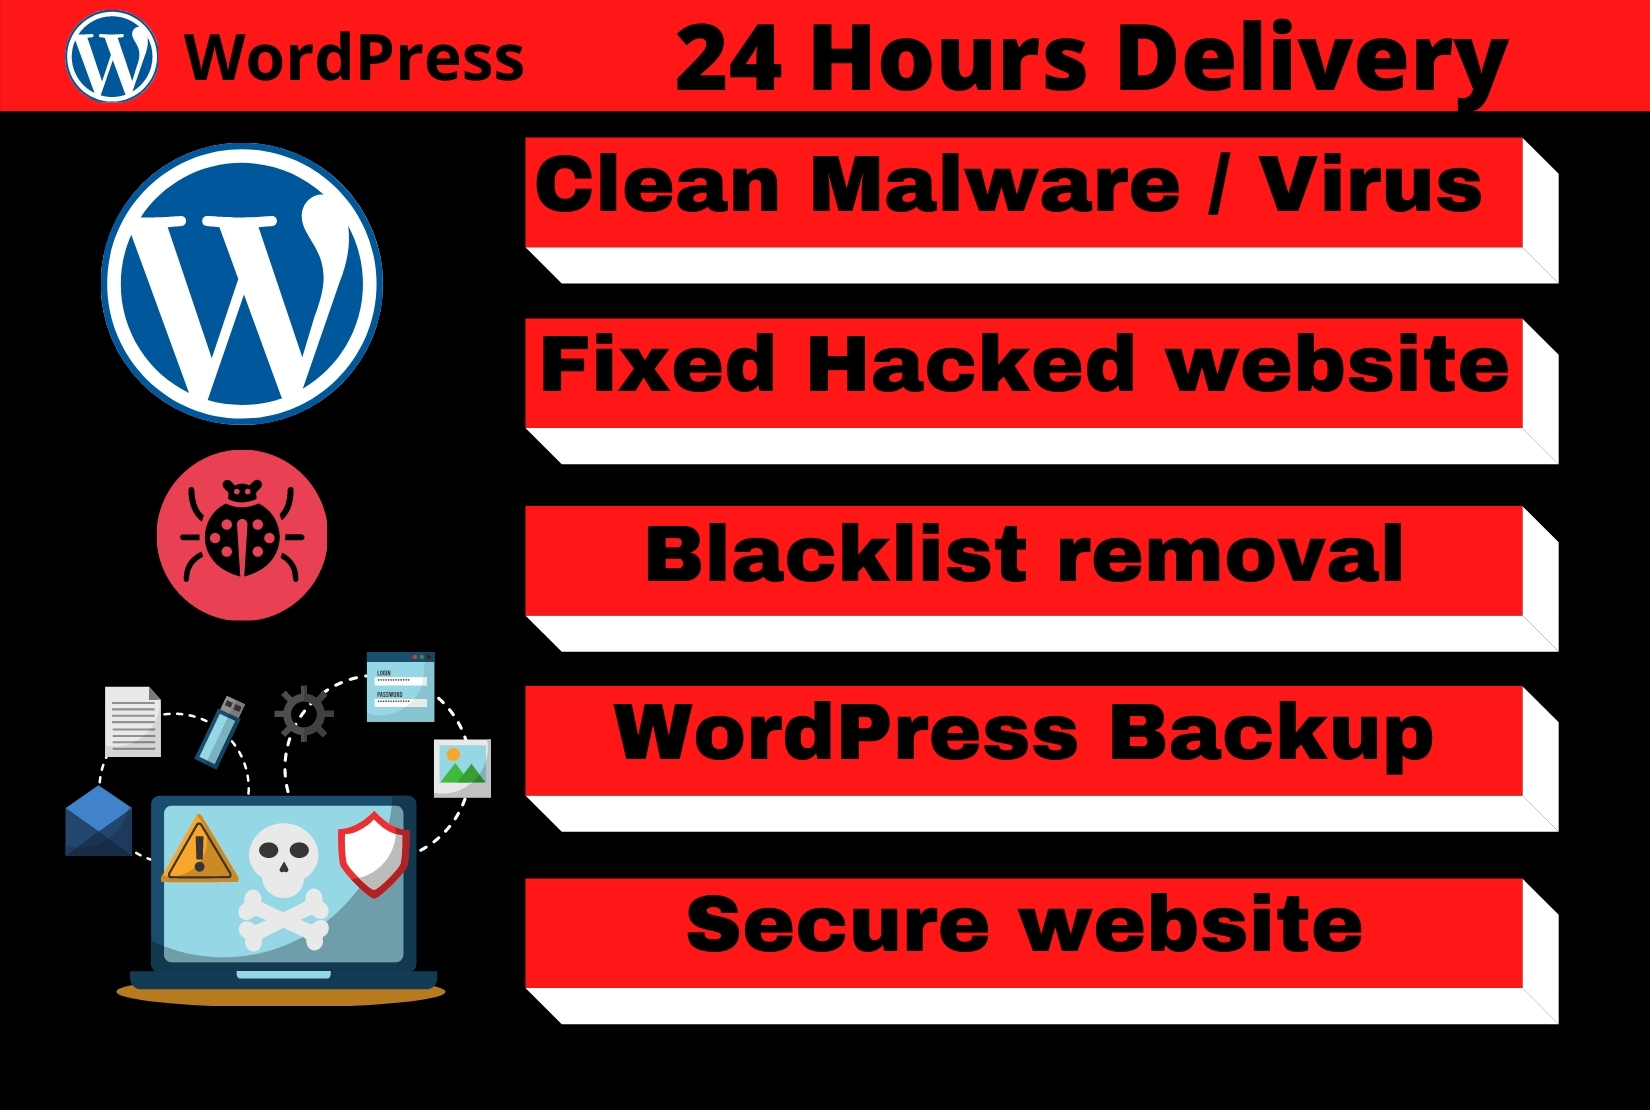 do wordpress malware removal, fix hacked wordpress website